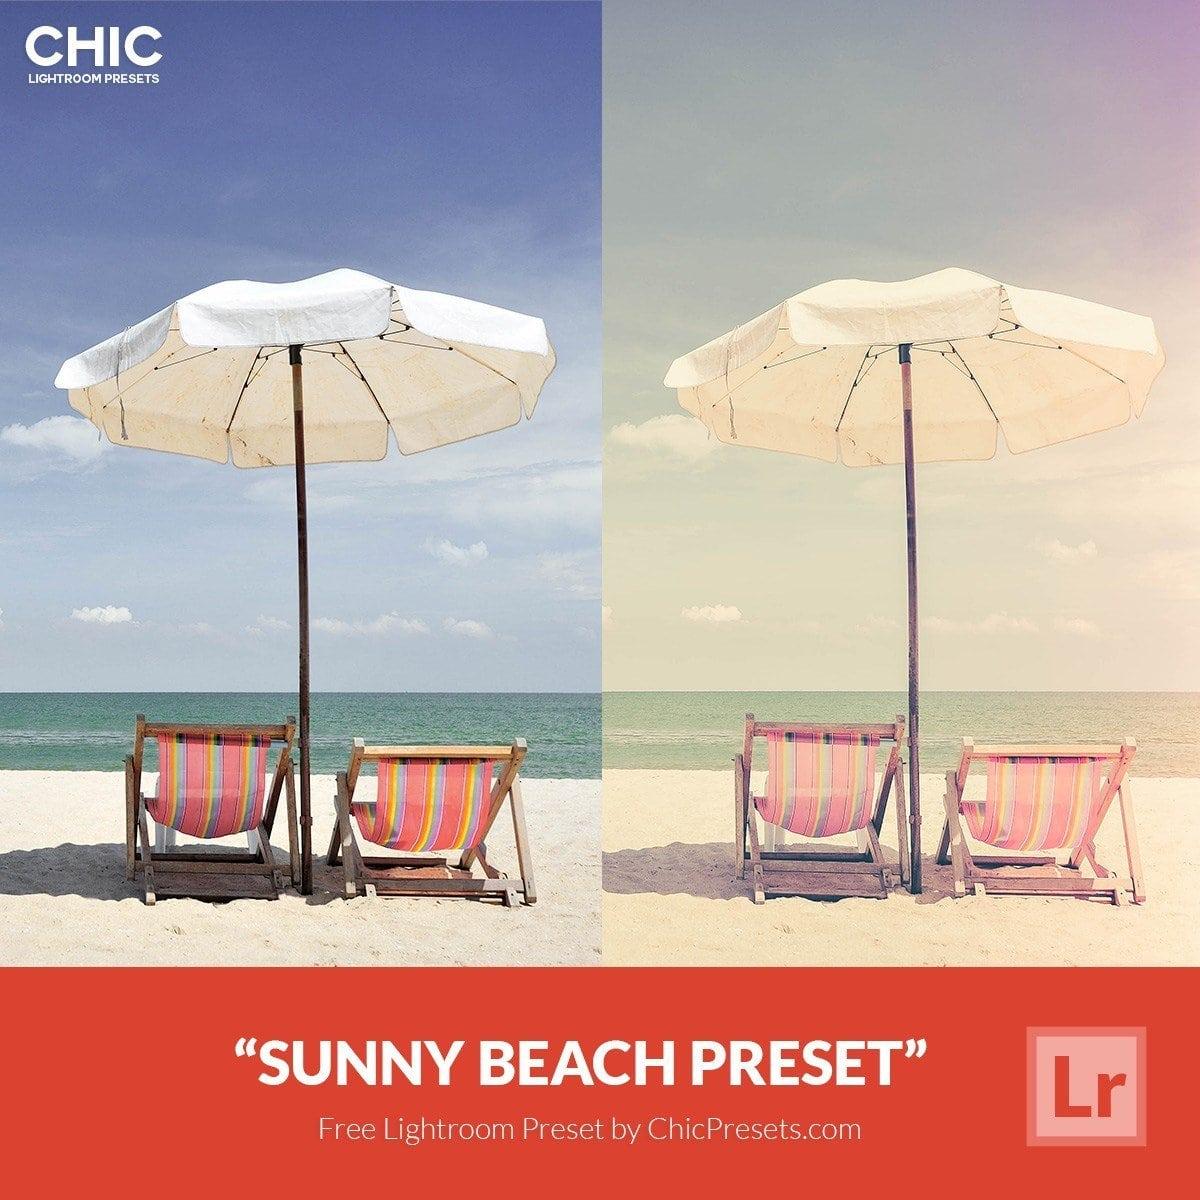 Free-Lightroom-Preset-Sunny-Beach